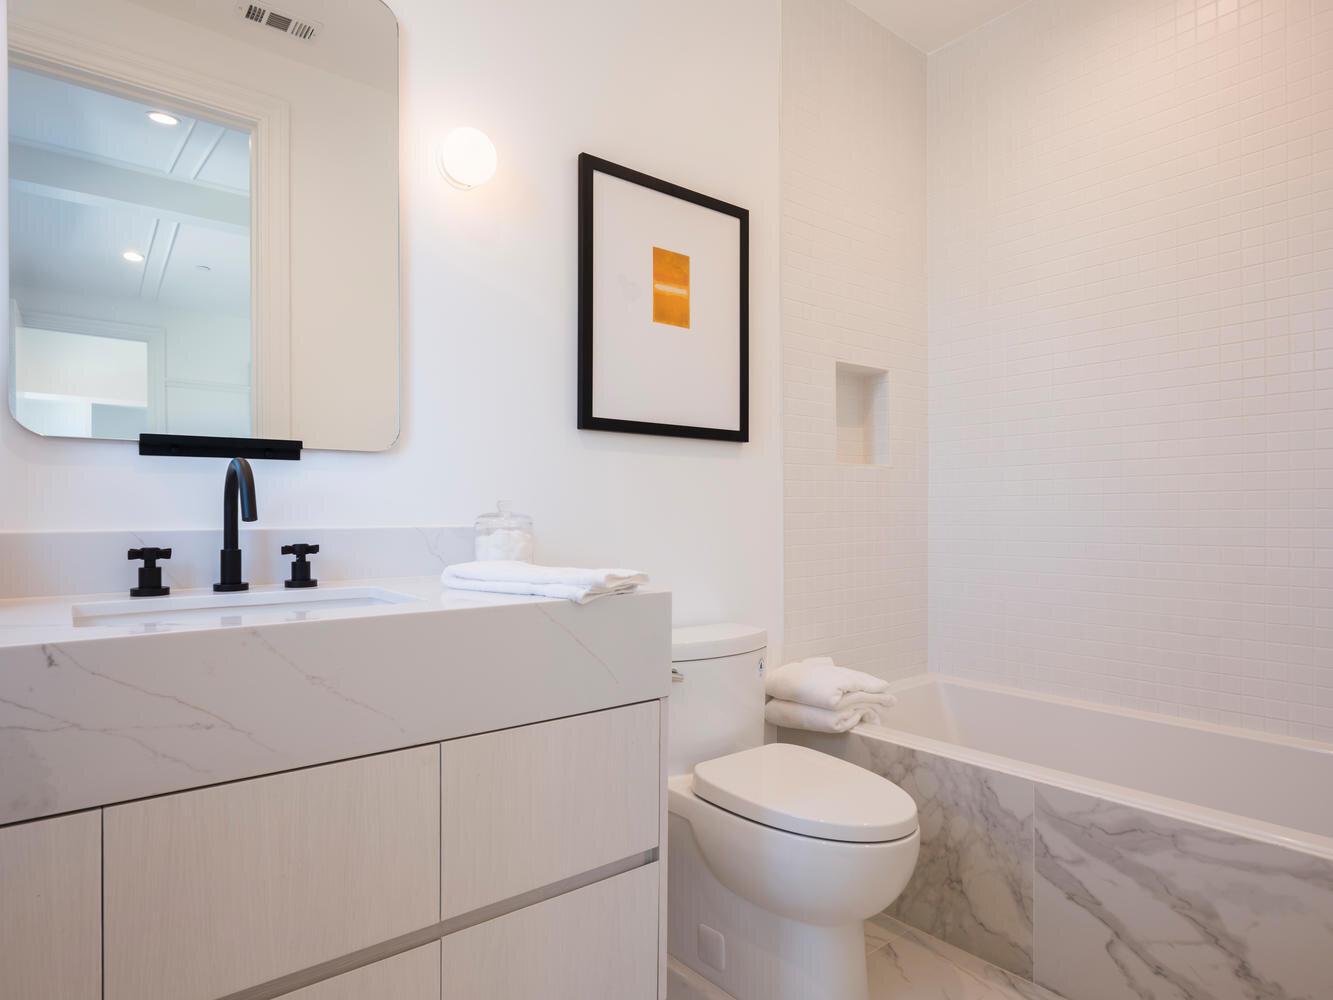 950 Kagawa St Pacific-large-038-019-Bathroom-1334x1000-72dpi.jpg